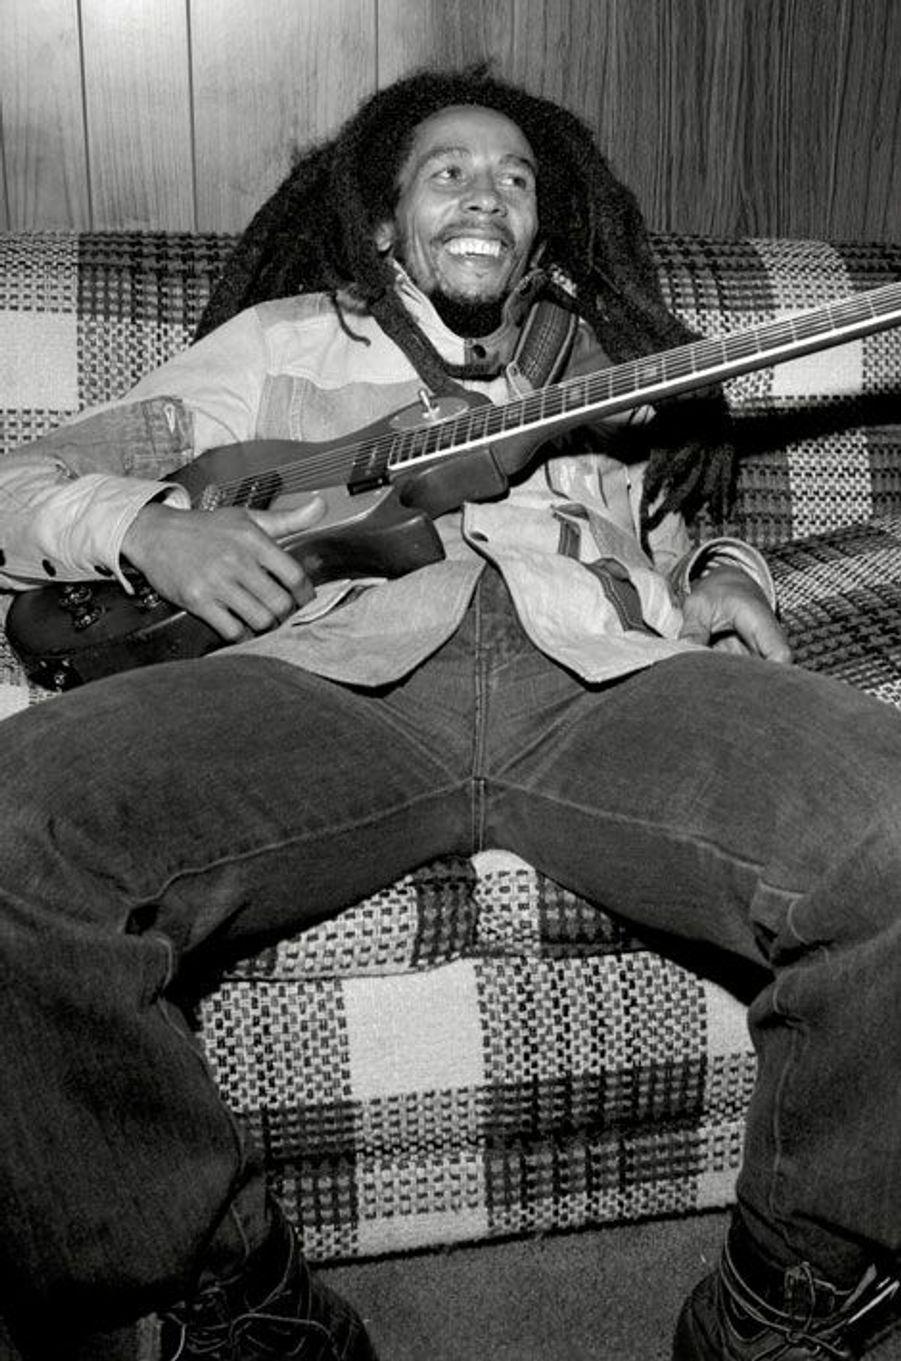 5- Bob Marley 20 millions de dollars